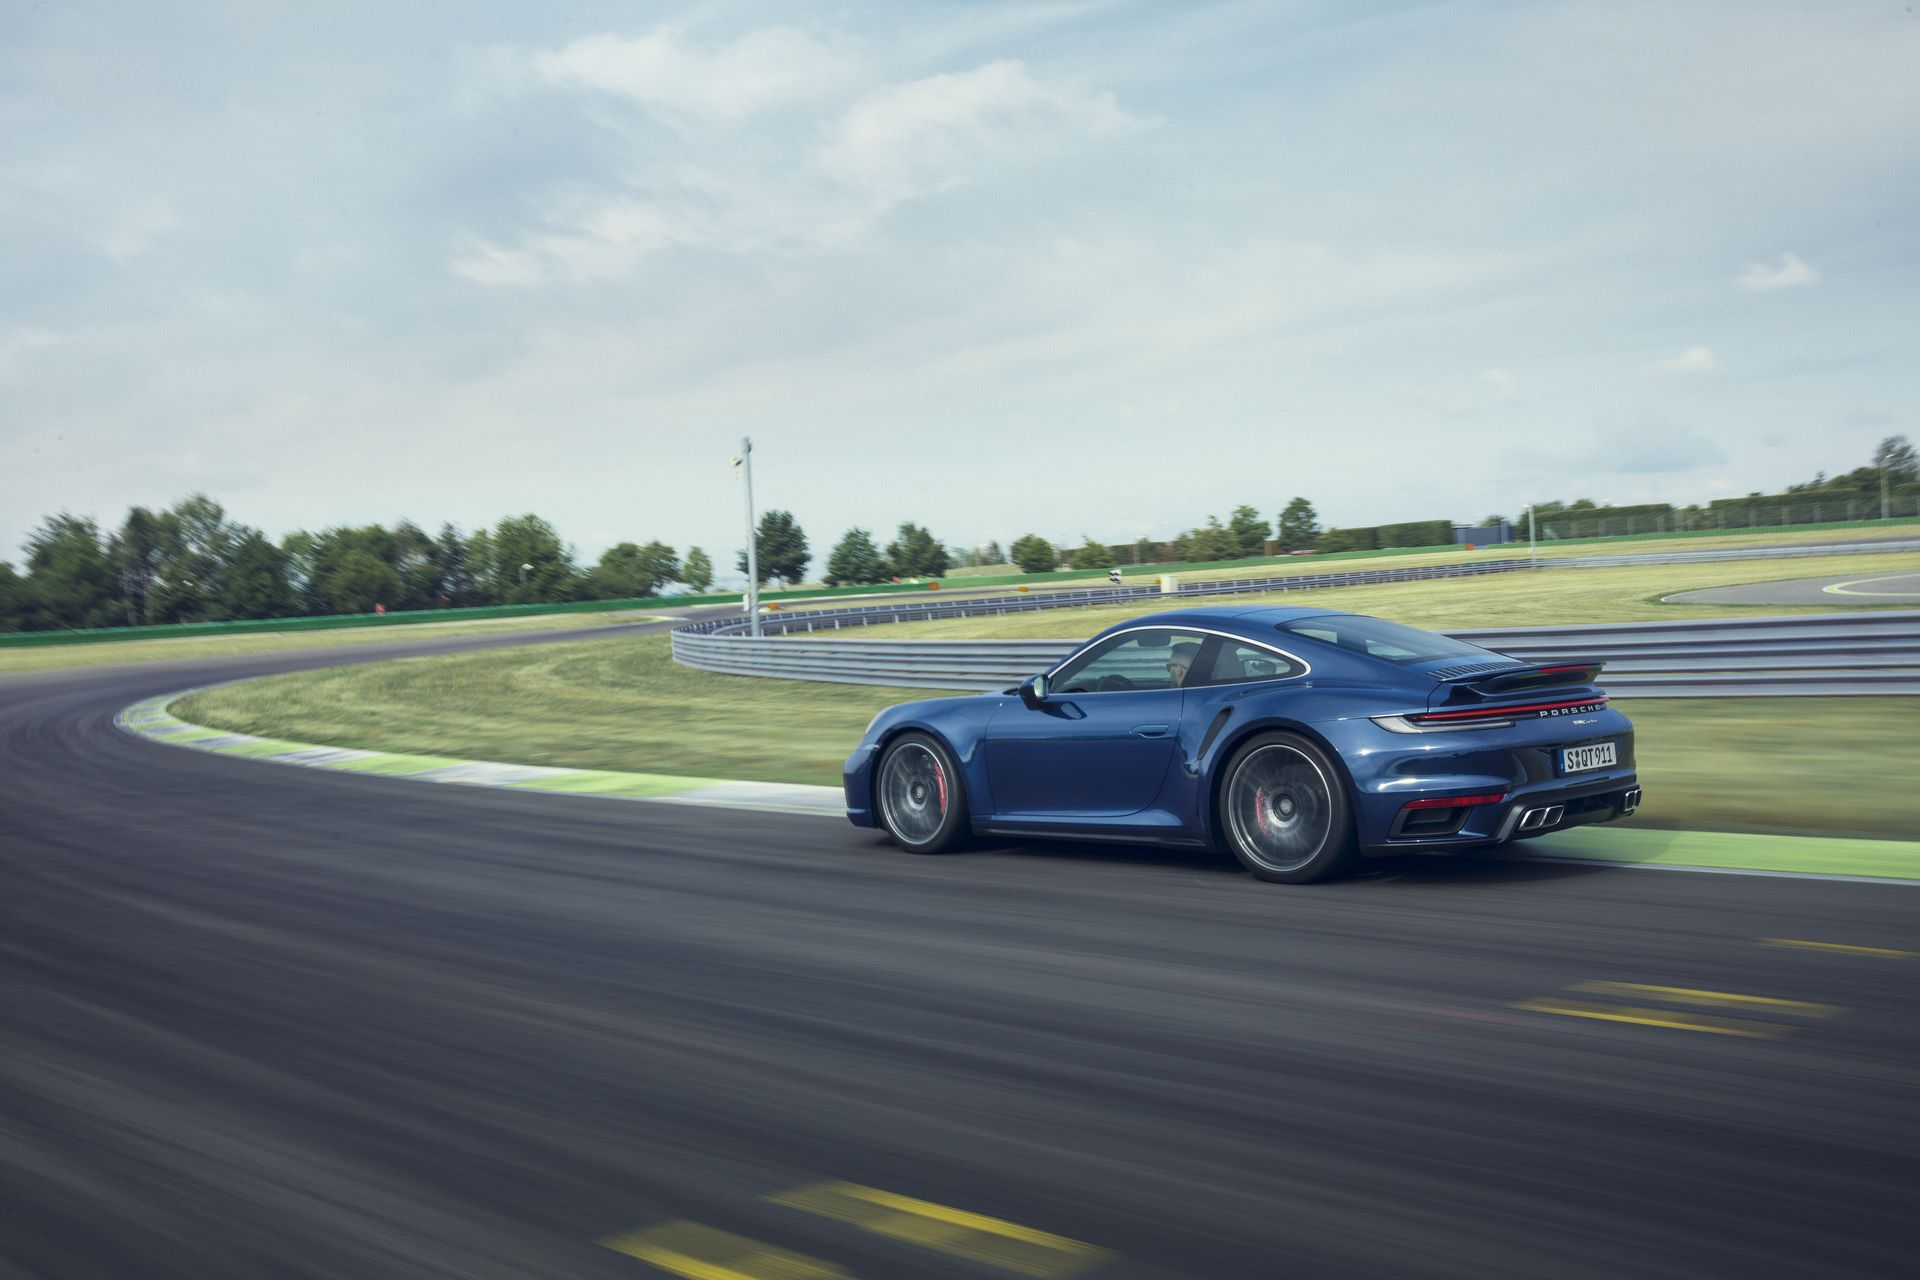 Porsche-911-Turbo-2020-6